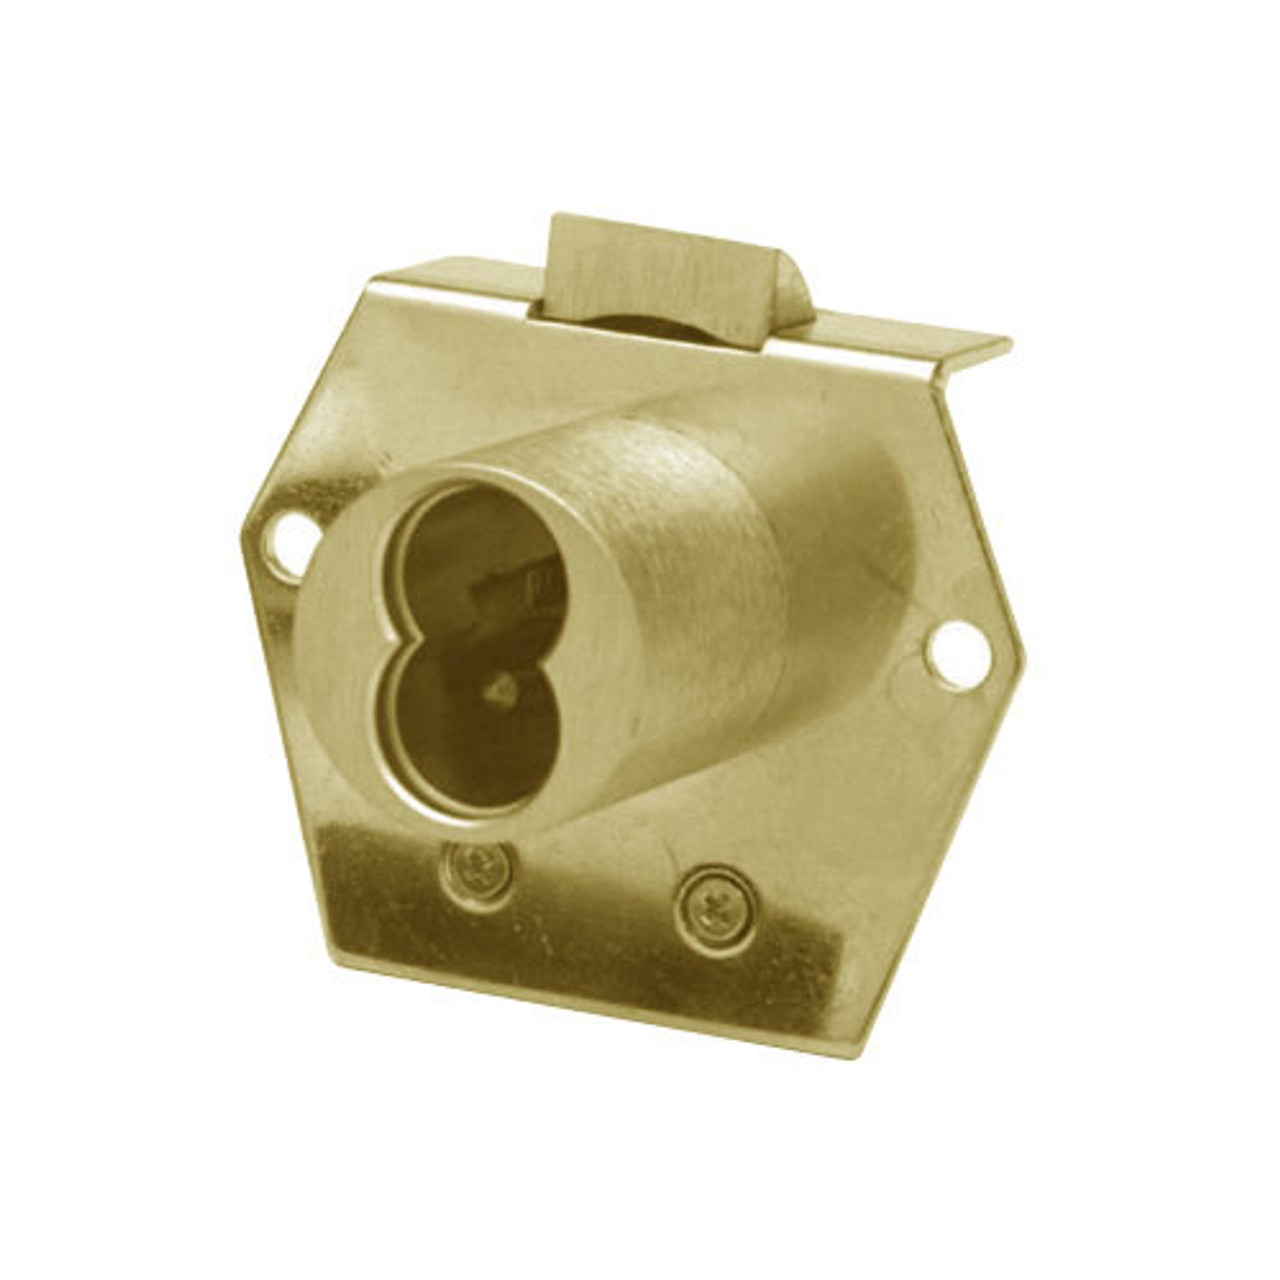 Olympus 725RL-DW-VH-US4 Cabinet Locks in Satin Brass Finish